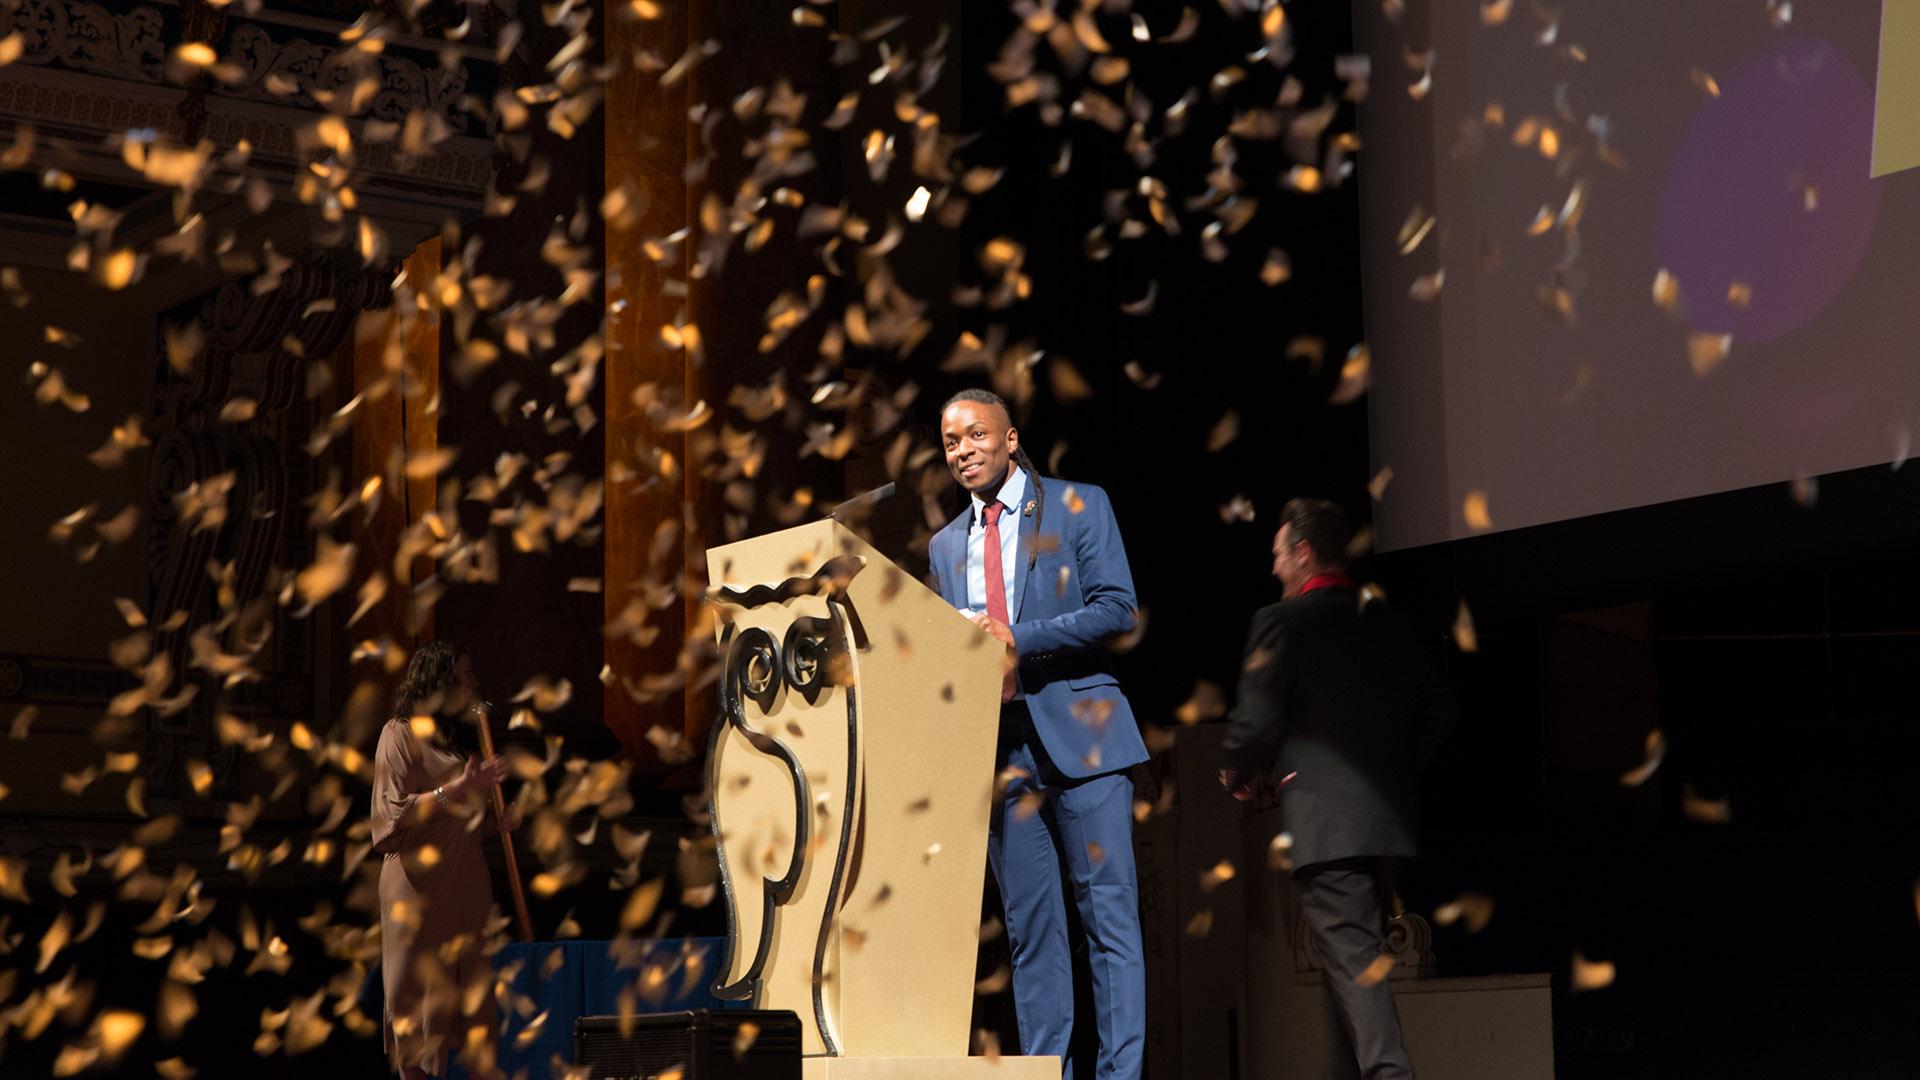 Golden Owls Awards 2018 - Host Nigel Clarke